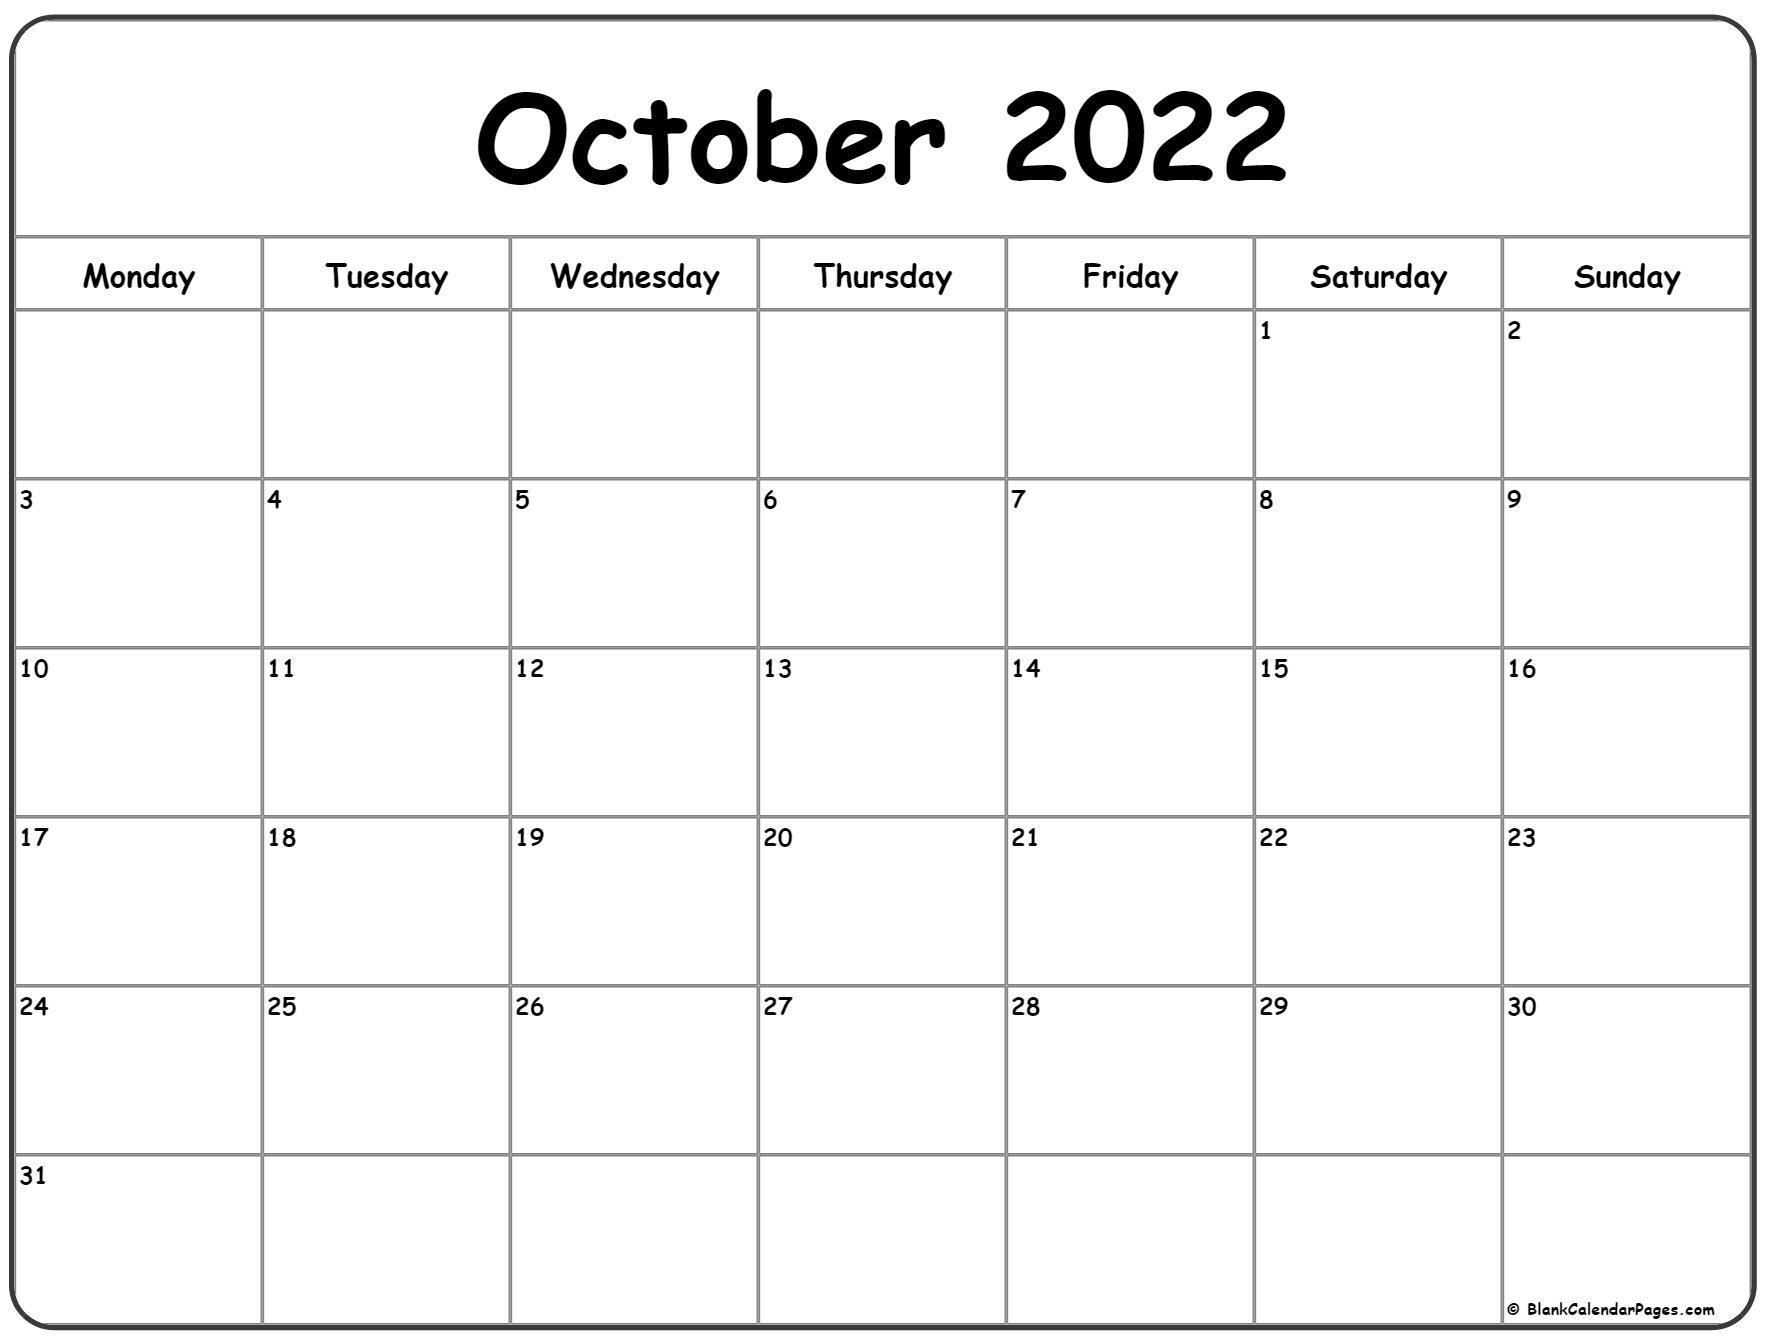 October 2022 Monday calendar. Monday to Sunday